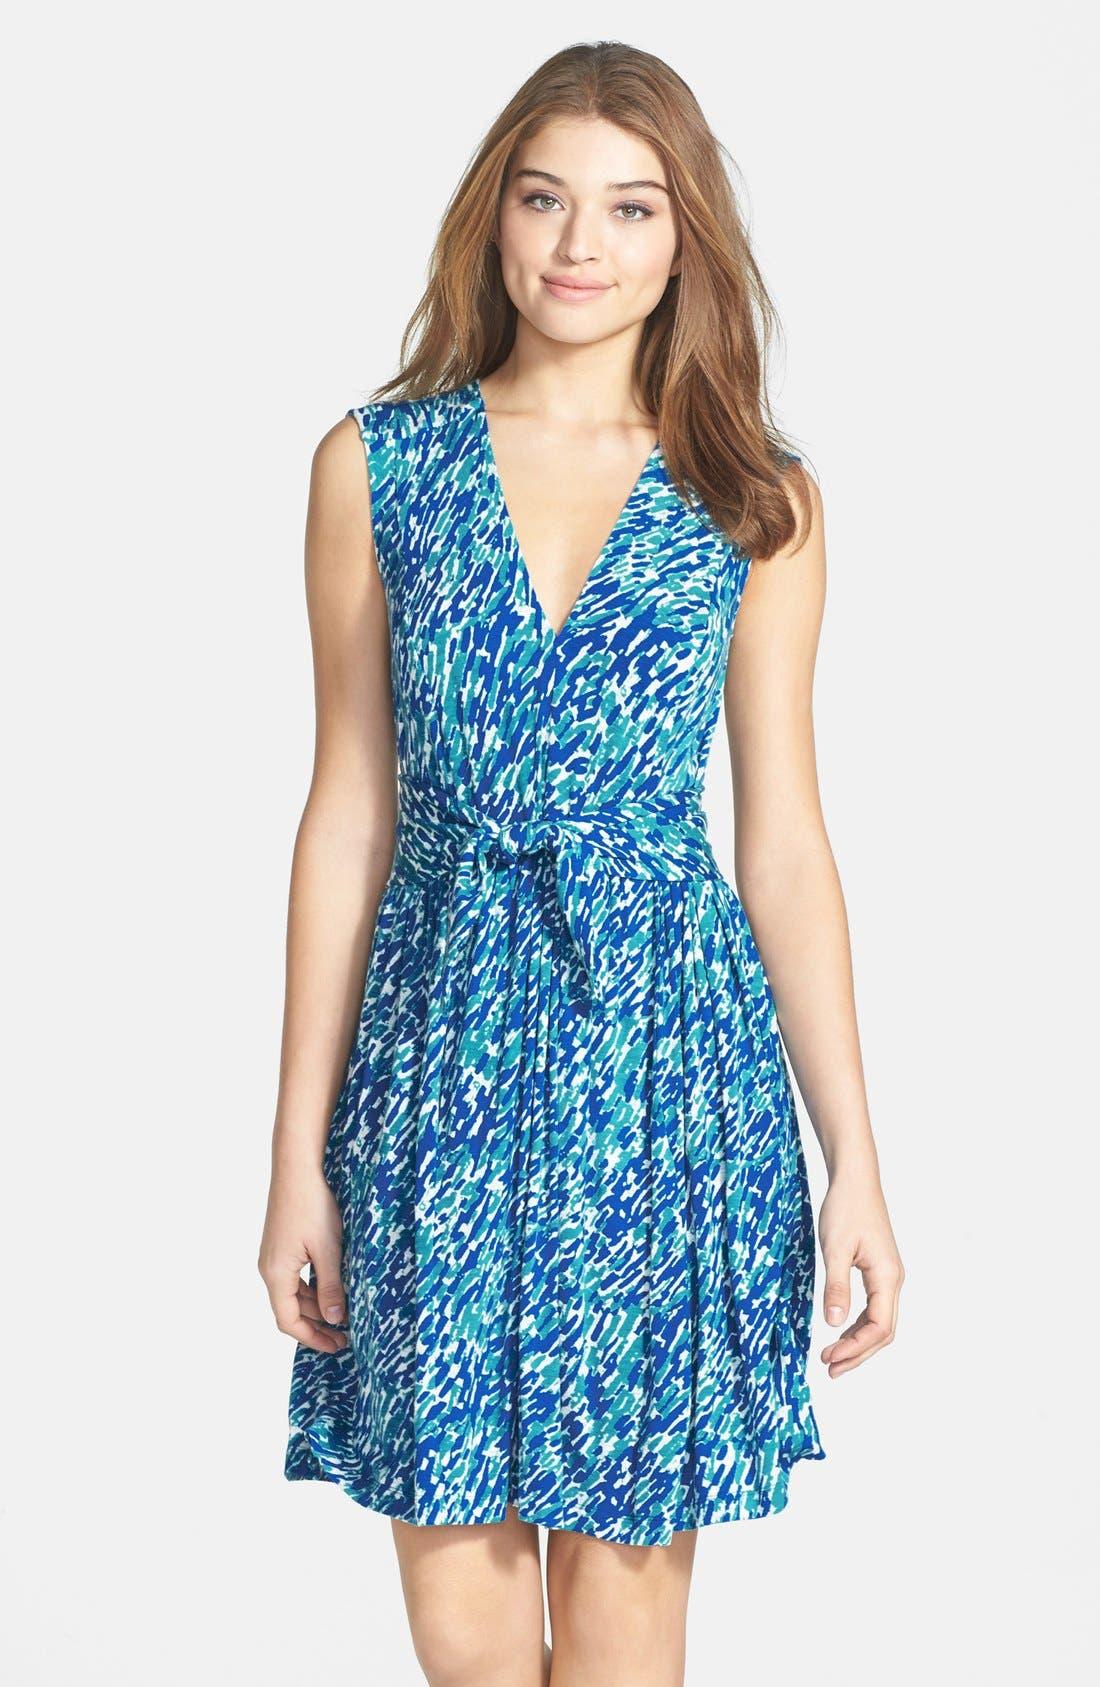 Main Image - Plenty by Tracy Reese 'Joanne' Print Jersey Fit & Flare Dress